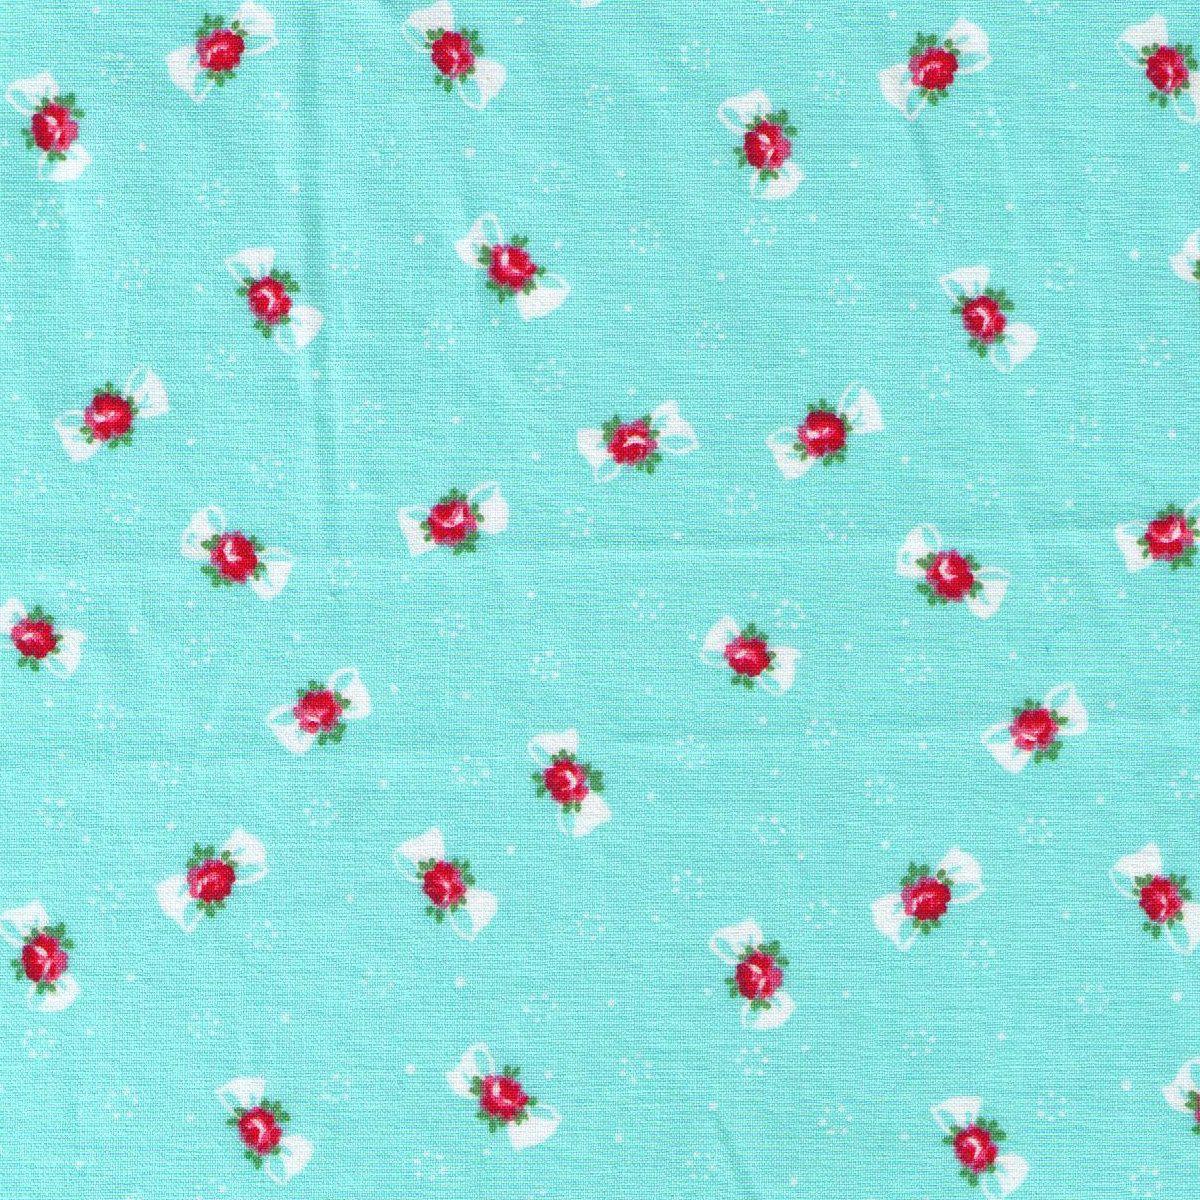 HALF YARD Yuwa Fabric -Petite Bows and Flowers on Aqua Blue - Atsuko Matsuyama - Japanese Import Fabric by fabricsupply on Etsy